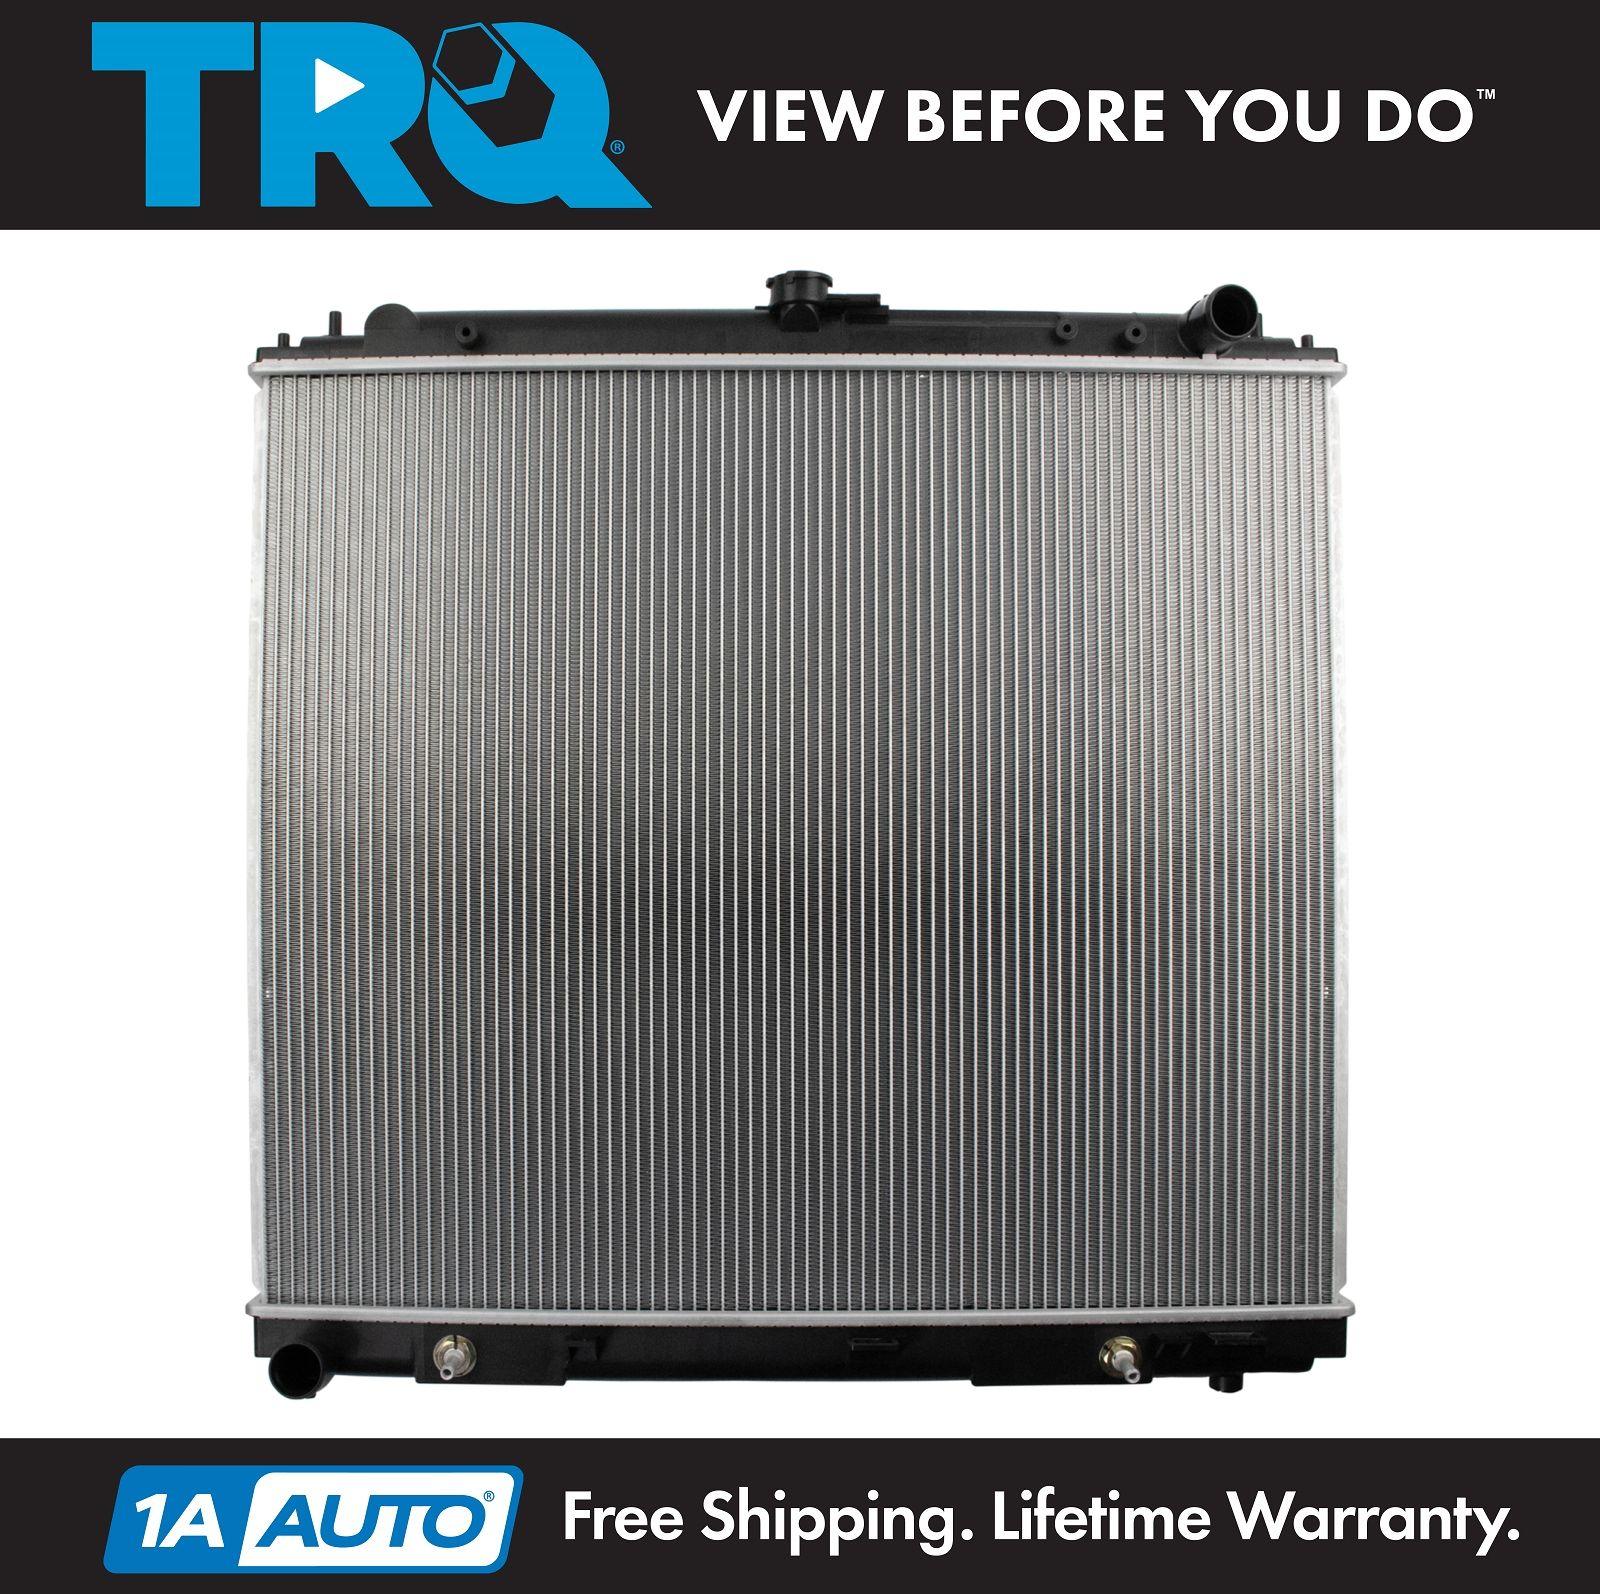 Auto Trans Oil Cooler Koyorad for Nissan Frontier Pathfinder Xterra 4.0 V6